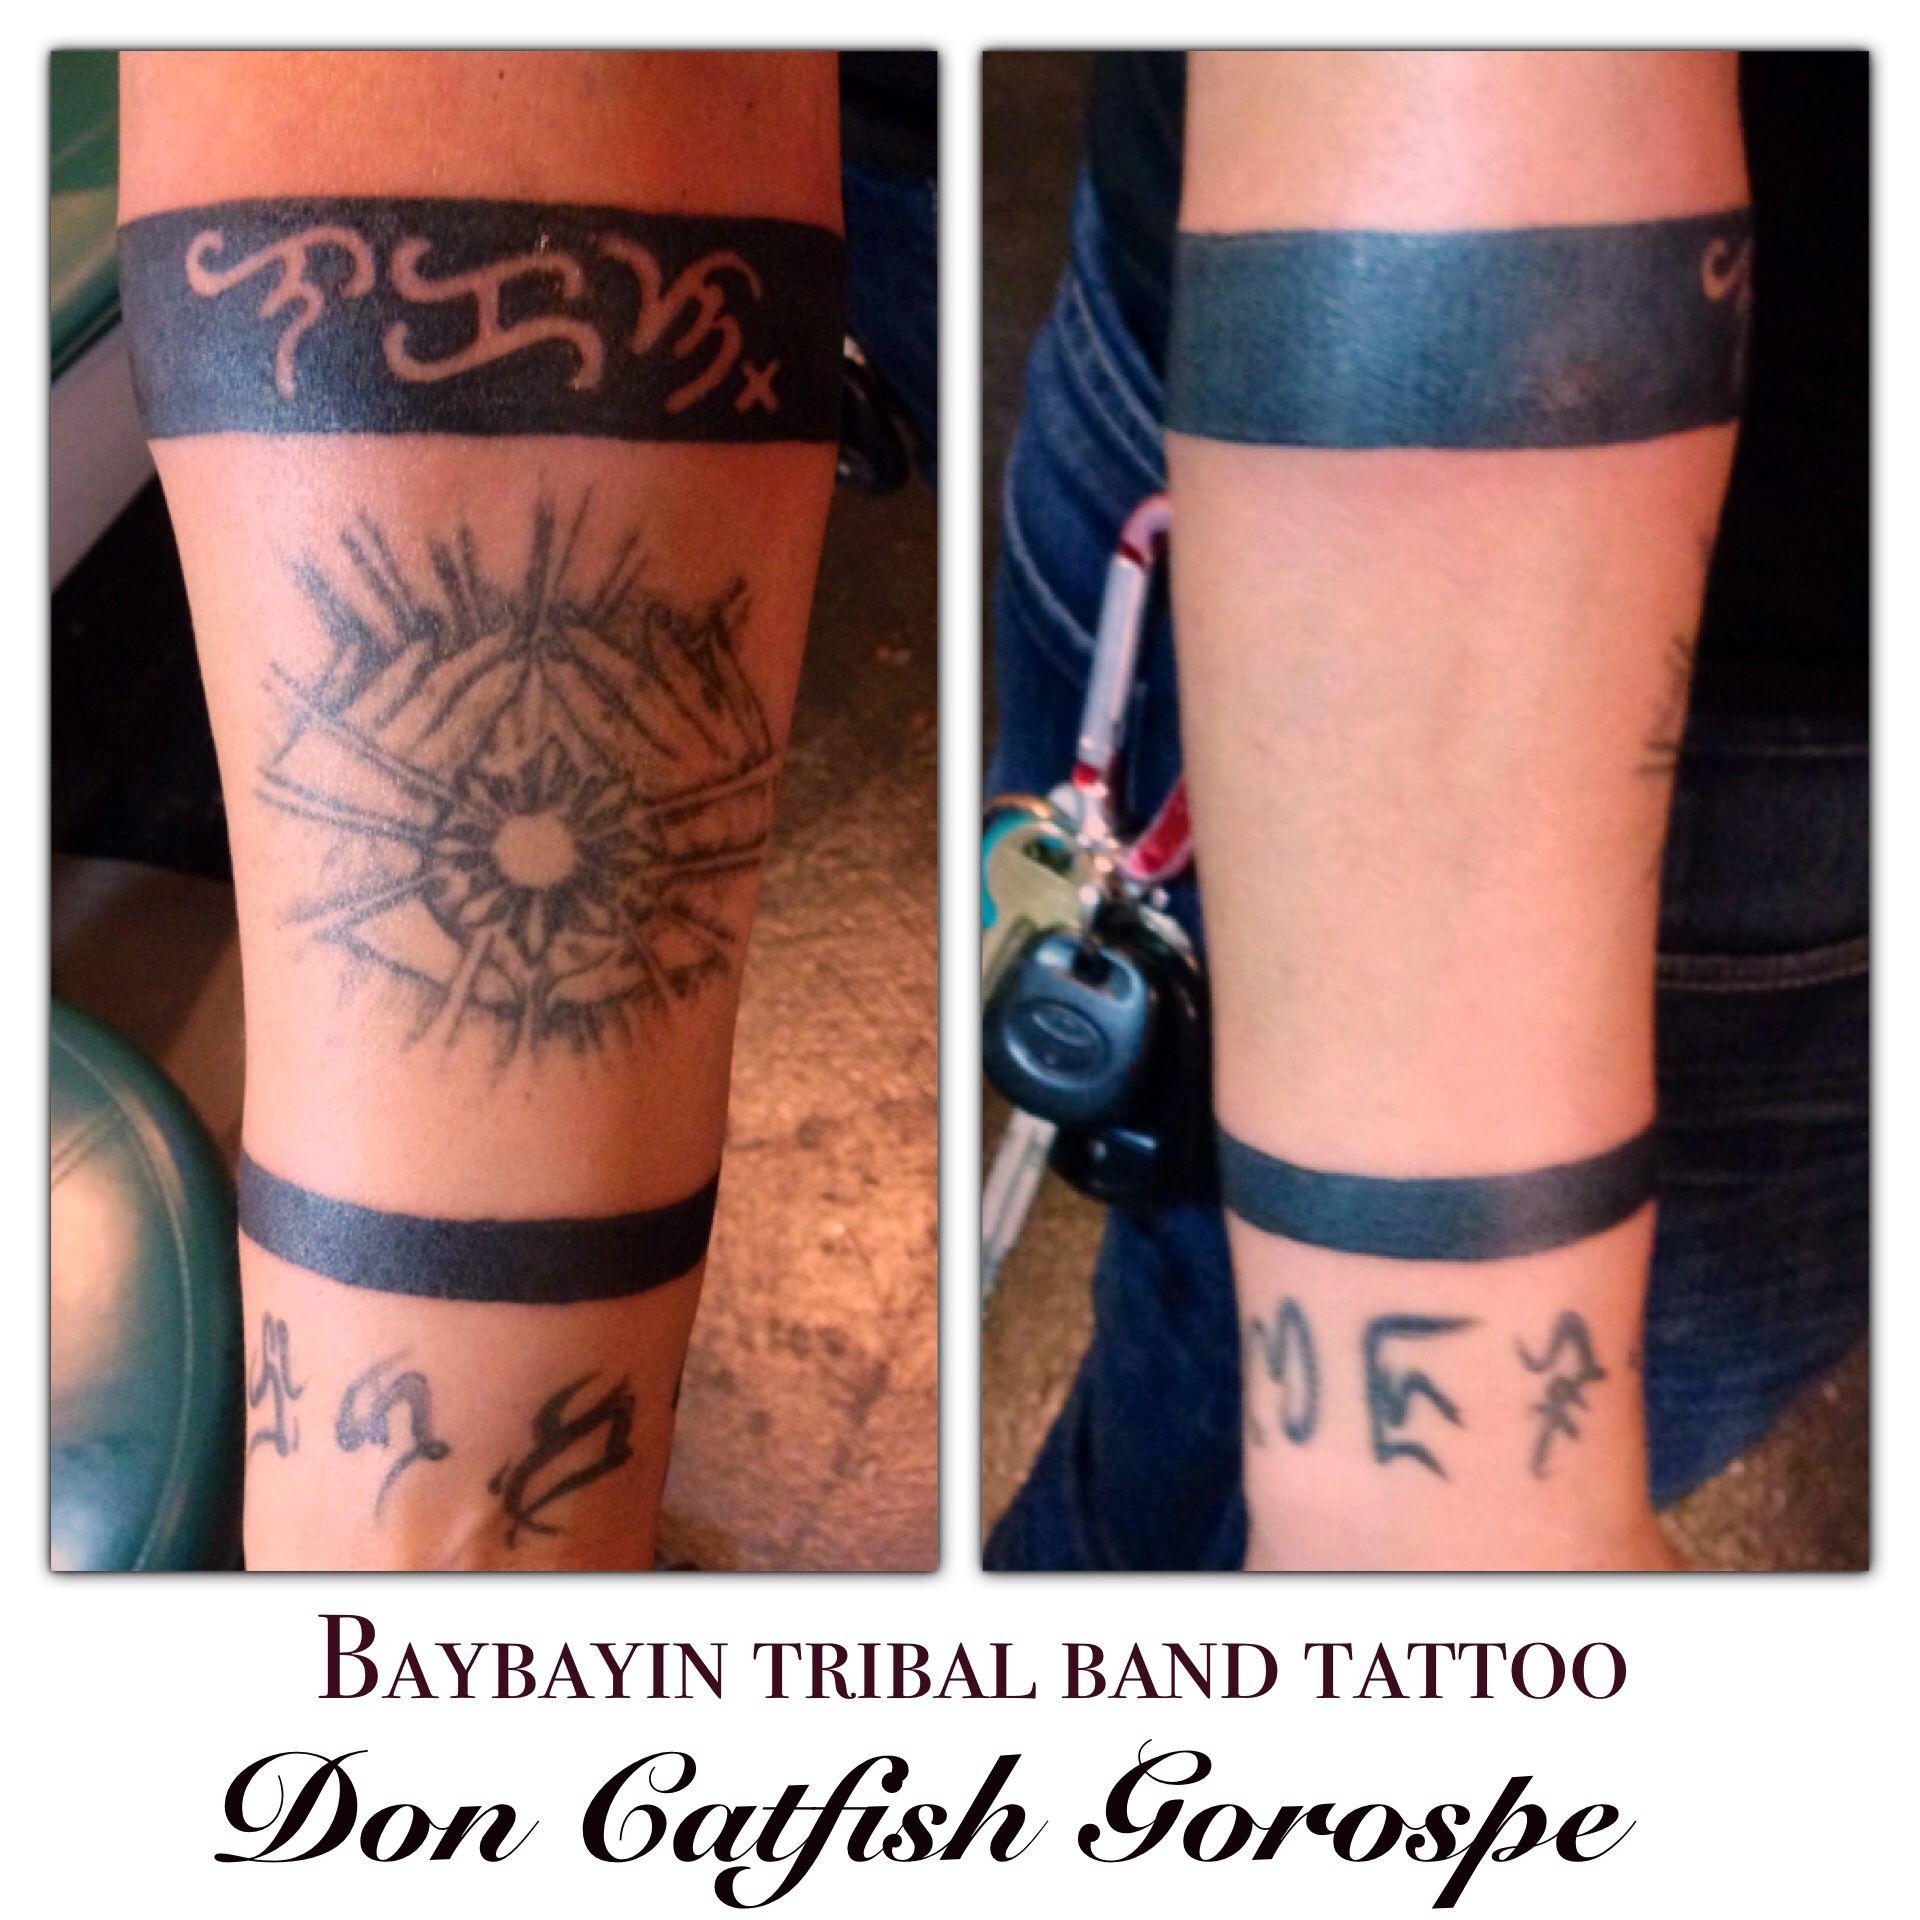 Pin By Catfish Ink On My Tattoo Portfolio Tribal Band Tattoo Tattoos Tribal Band